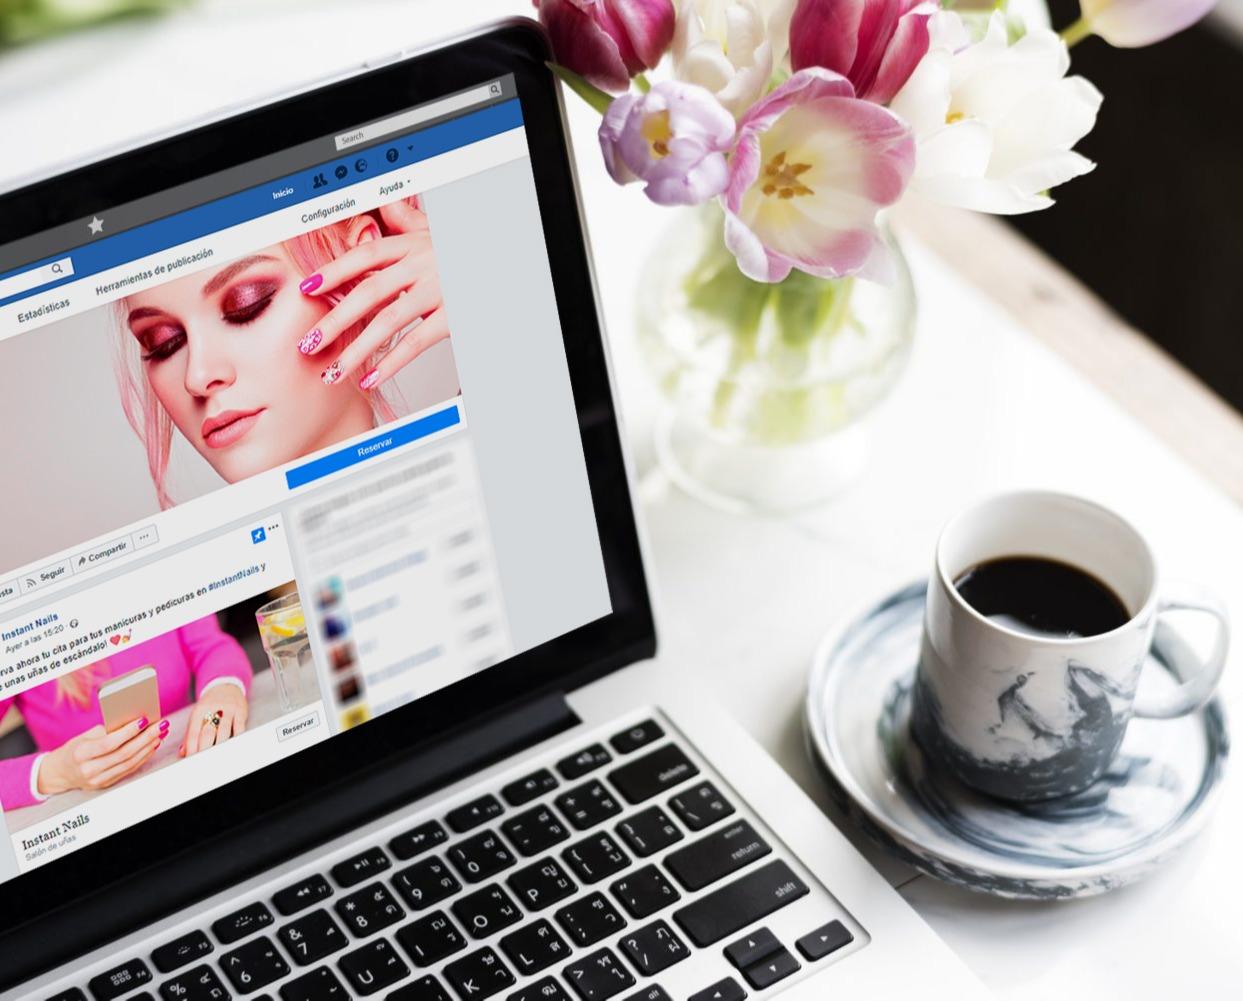 software di gestione e marketing per estetica - prenotazioni online per estetica - prenotazioni online da Facebook